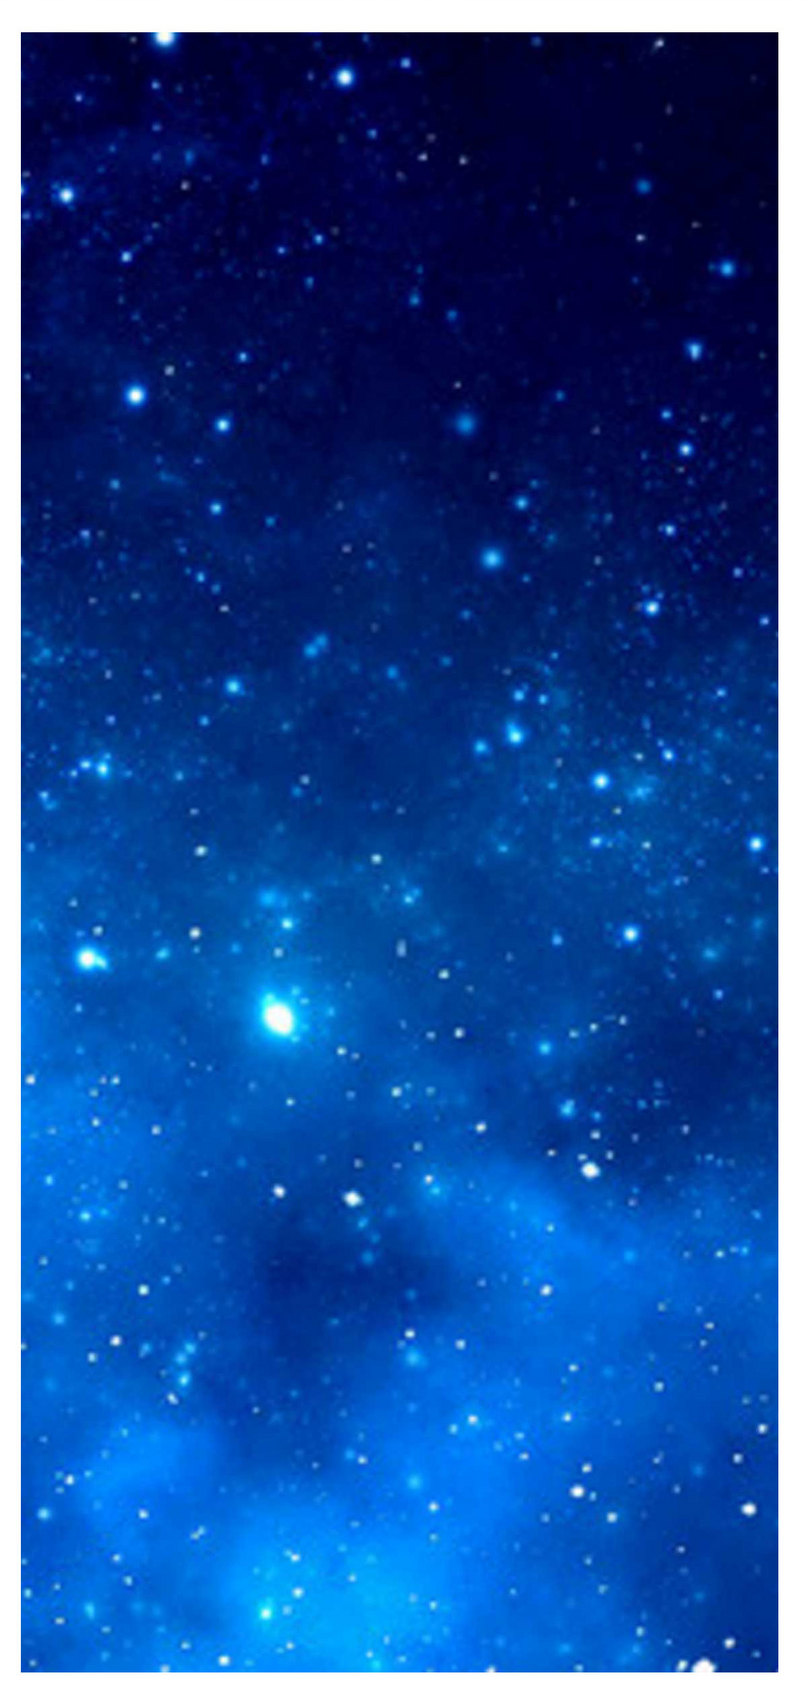 Langit Malam Biru Wallpaper Ponsel Gambar Unduh Gratis Latar